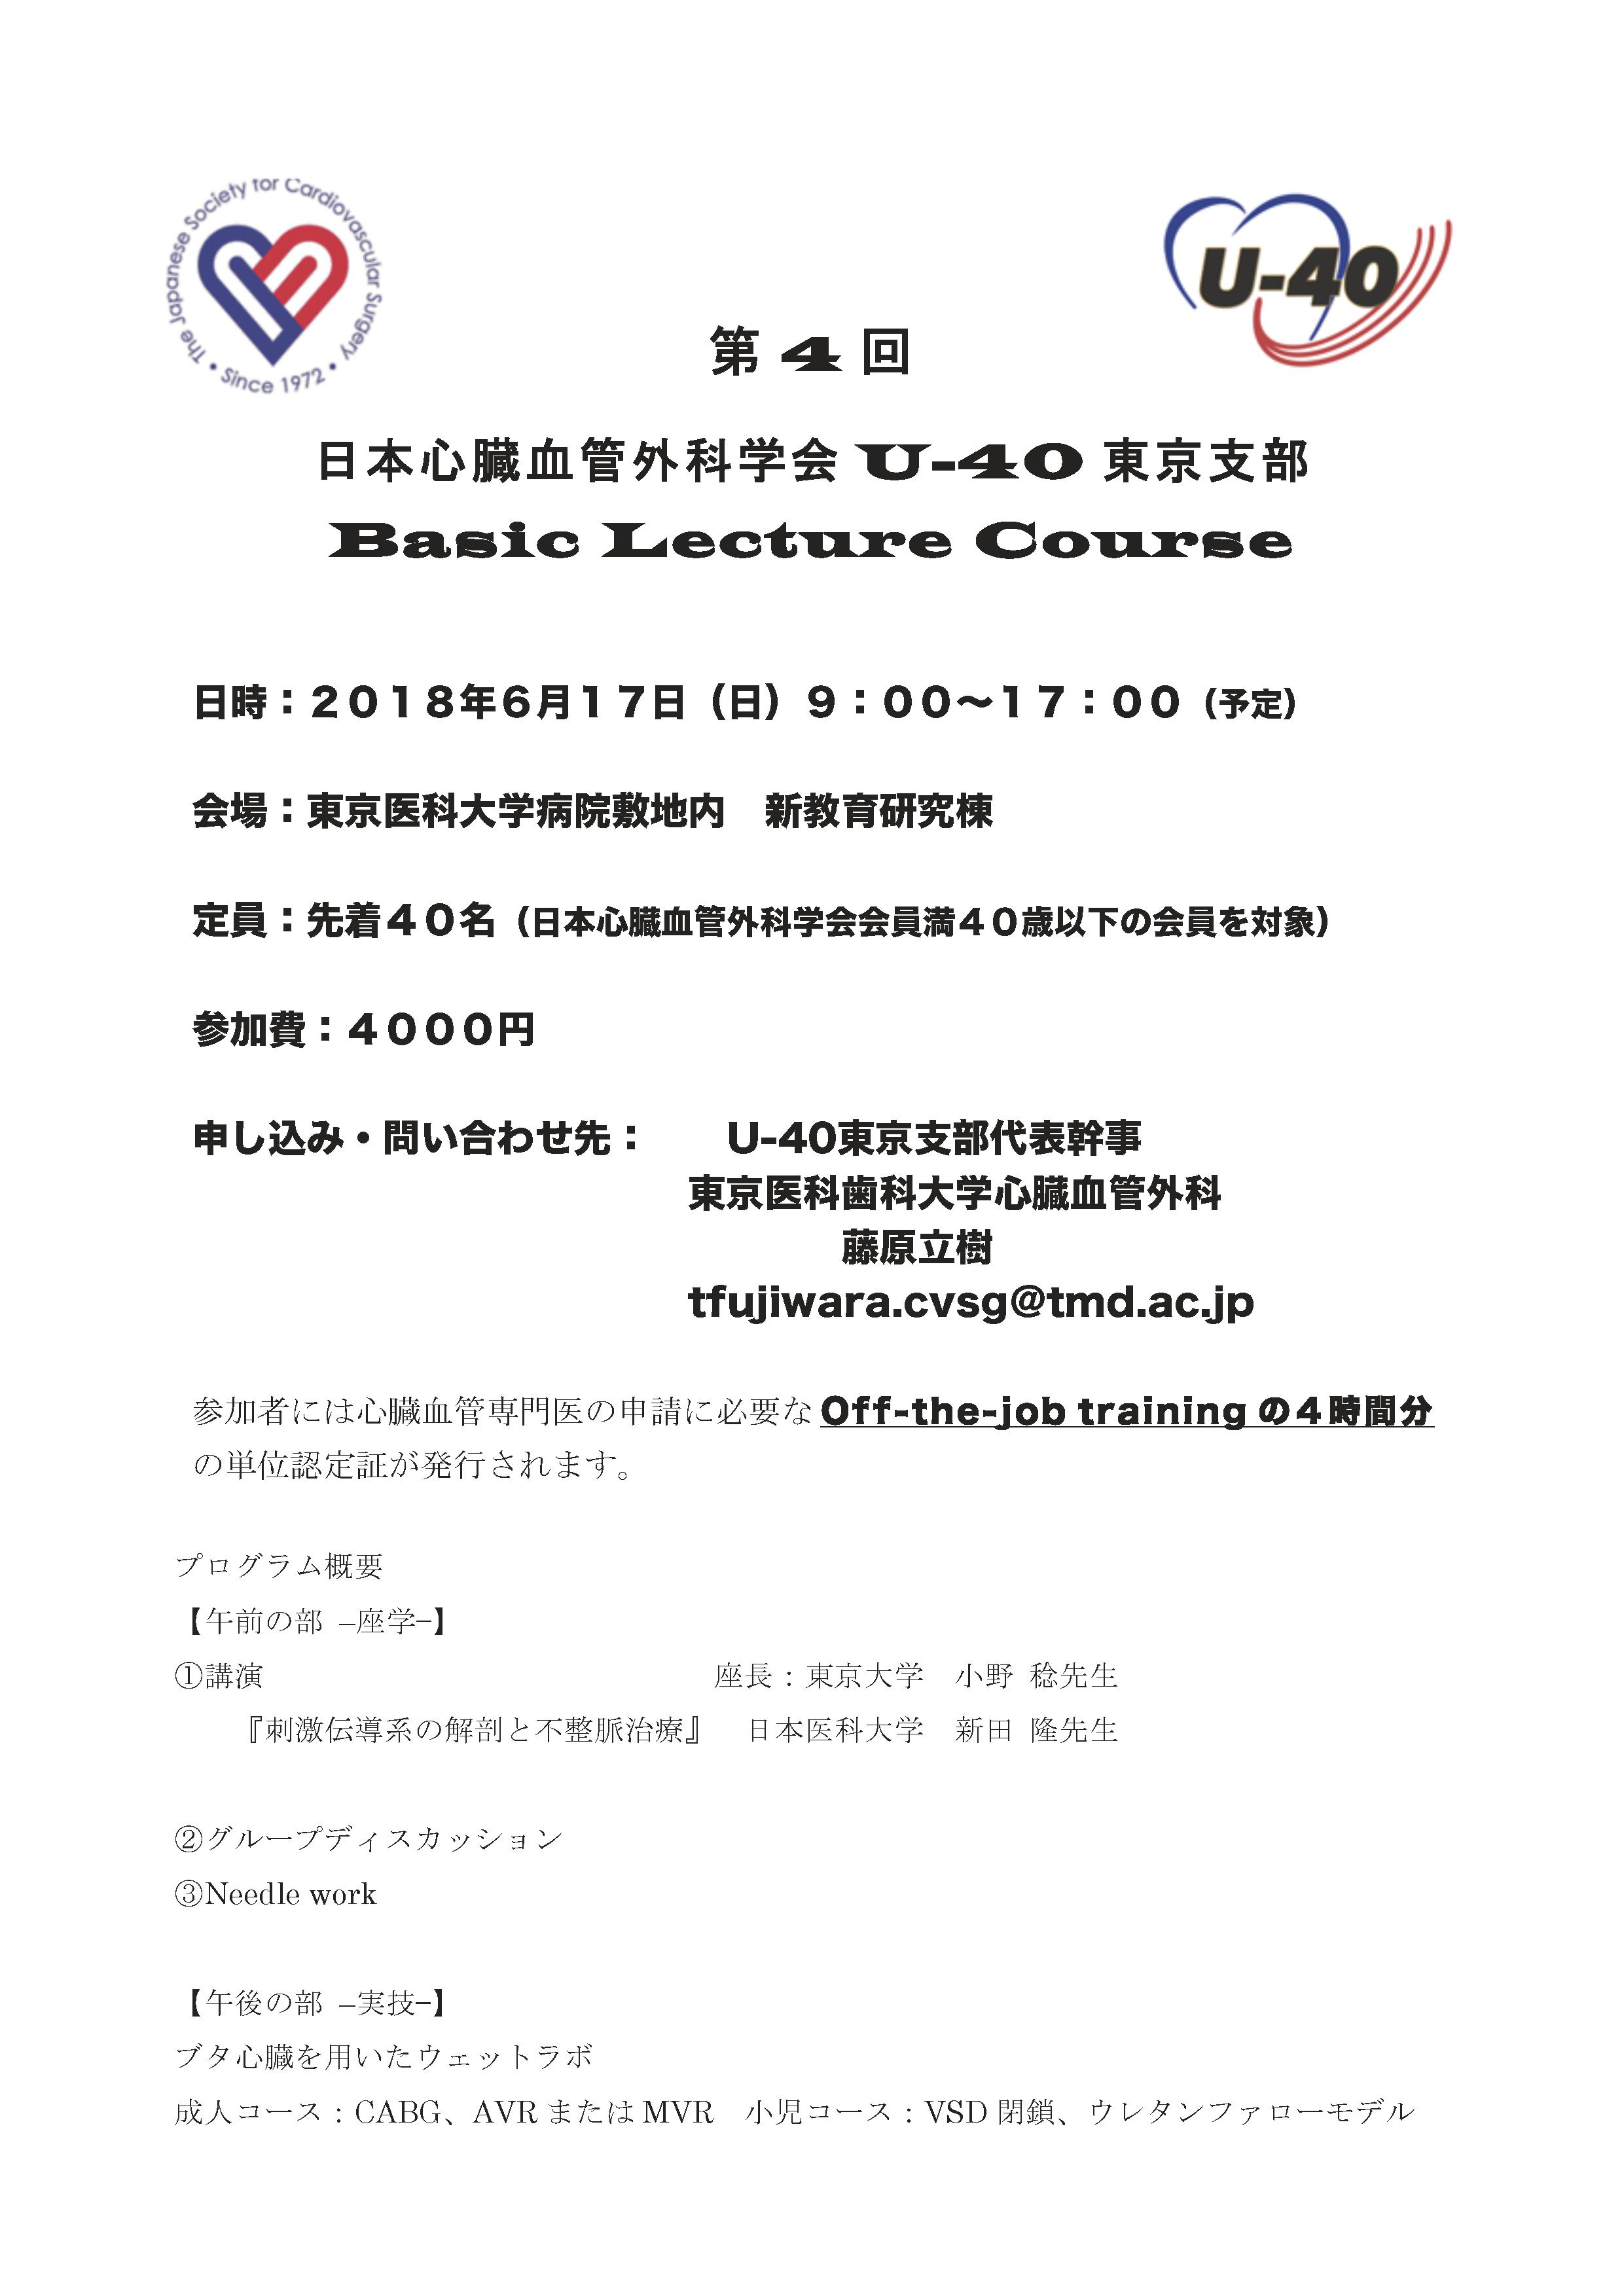 6月17日 第4回 U-40東京支部Basic Lecture Course